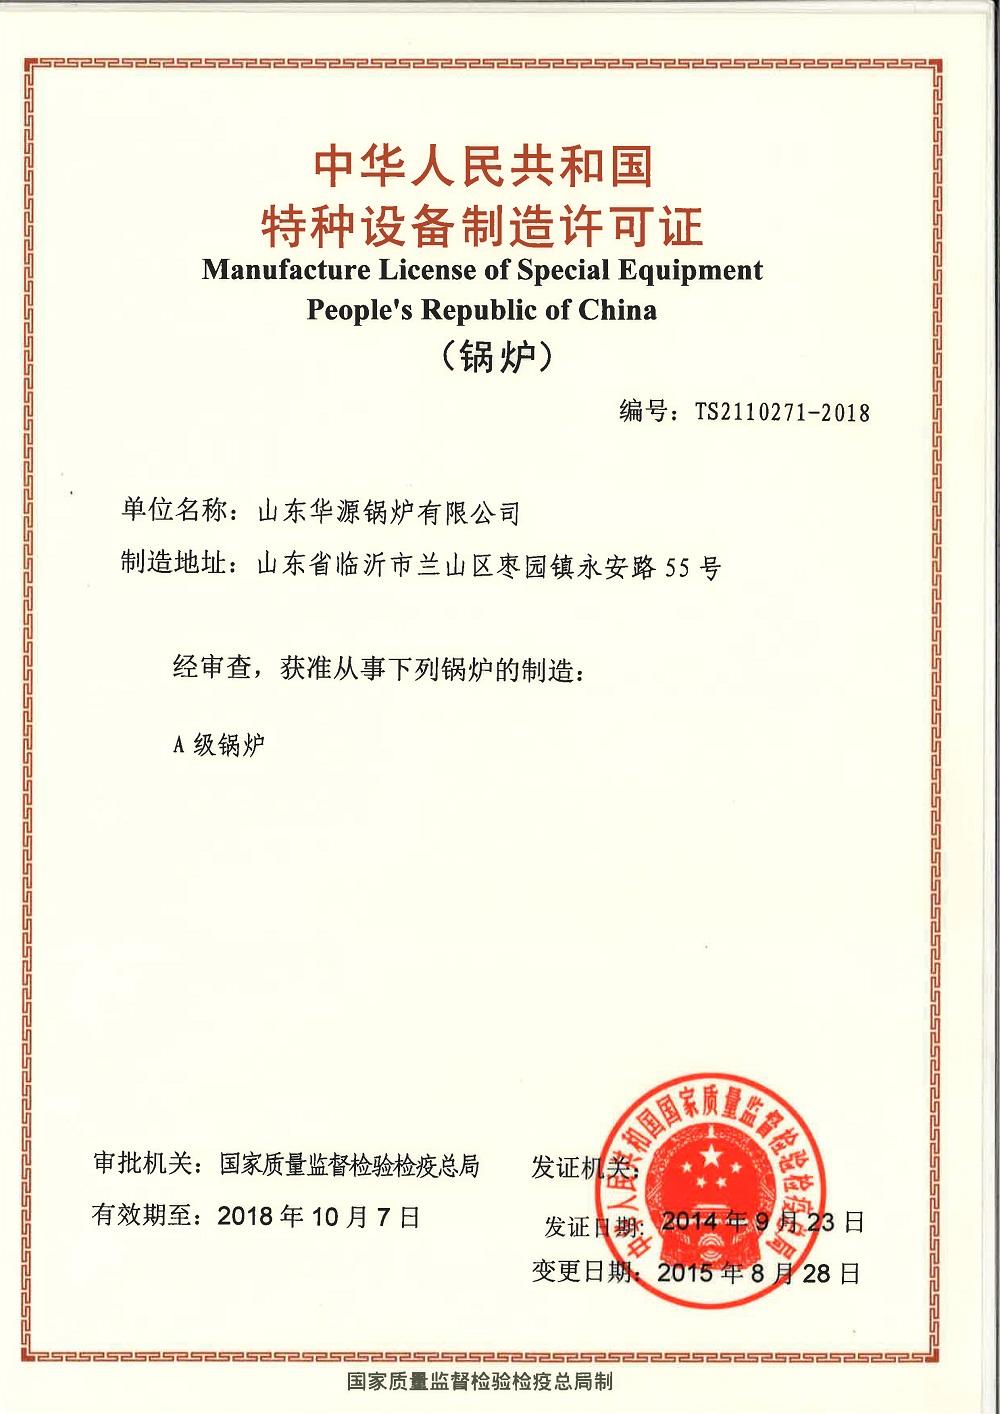 Grade A boiler manufacturing license